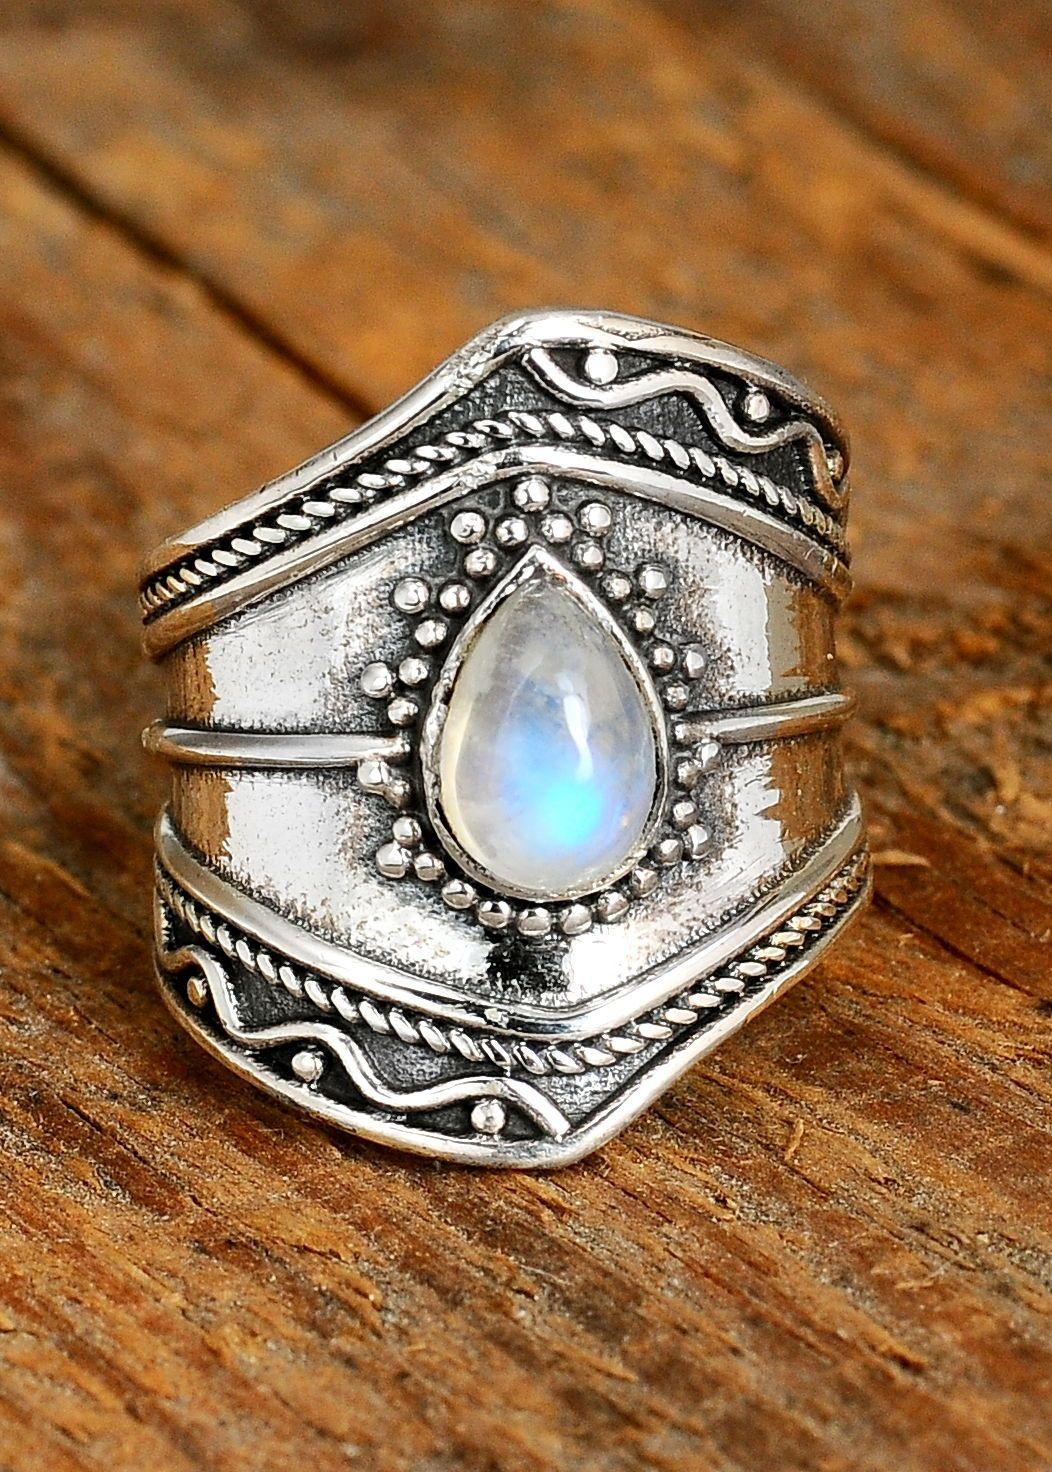 MOONSTONE RAINBOW RING silver moonstone  Sterling silver moonstone hand made ring  Moonstone jewelry  Vintage antique boho silver ring